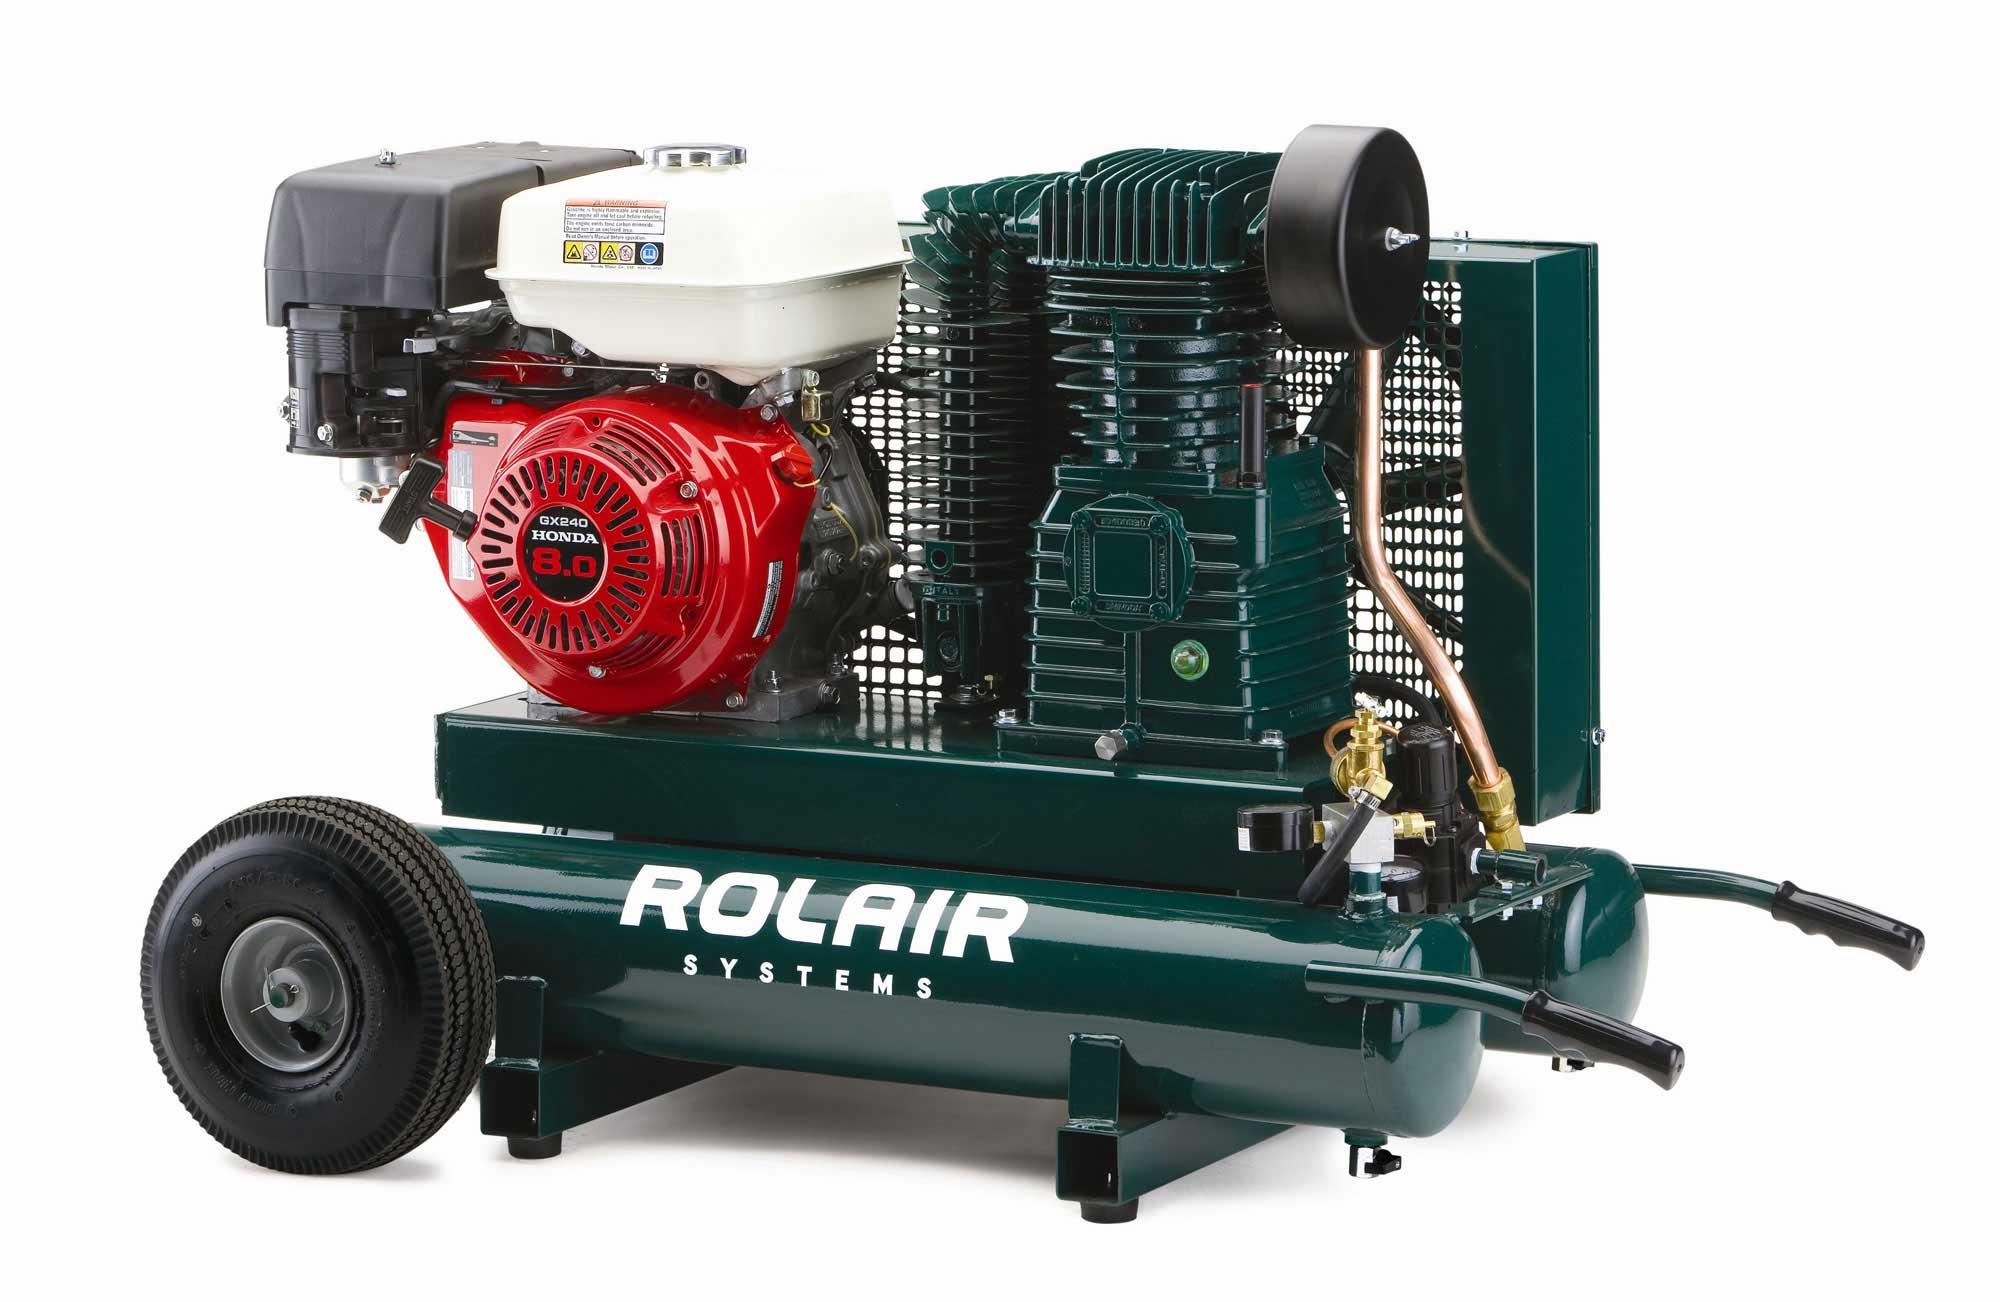 Rolair 8-HP 9-Gallon Gas Two-Stage Wheelbarrow Air Compressor w/ Honda Engine